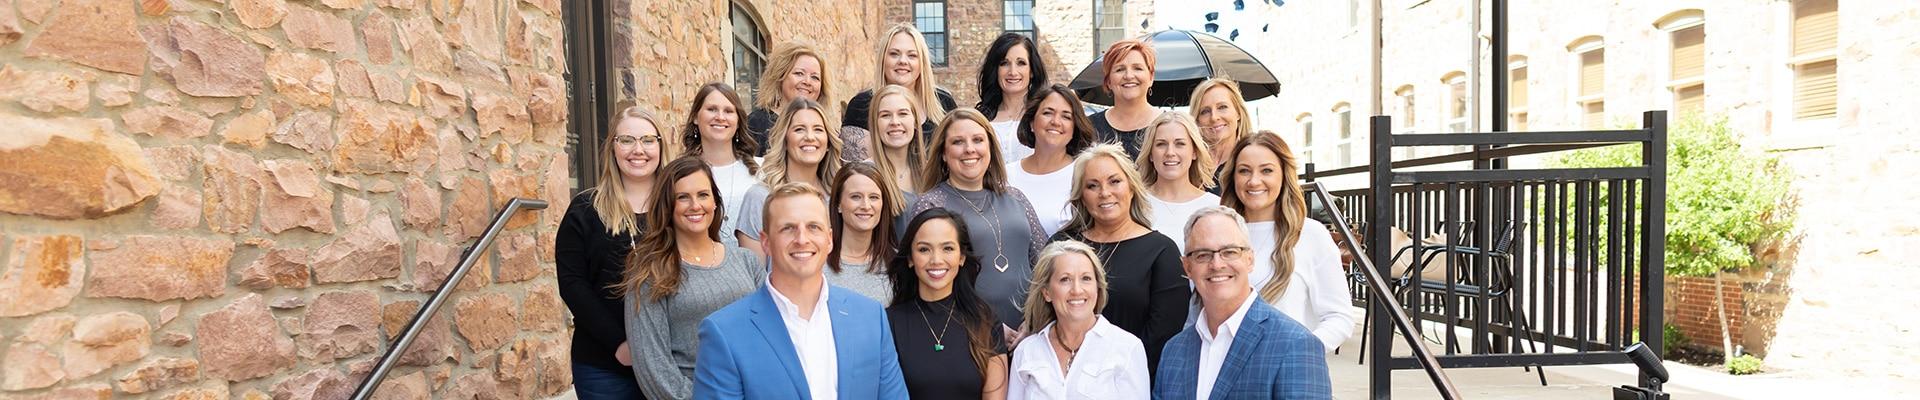 Journey-Orthodontics-Staff-photo-interior-header